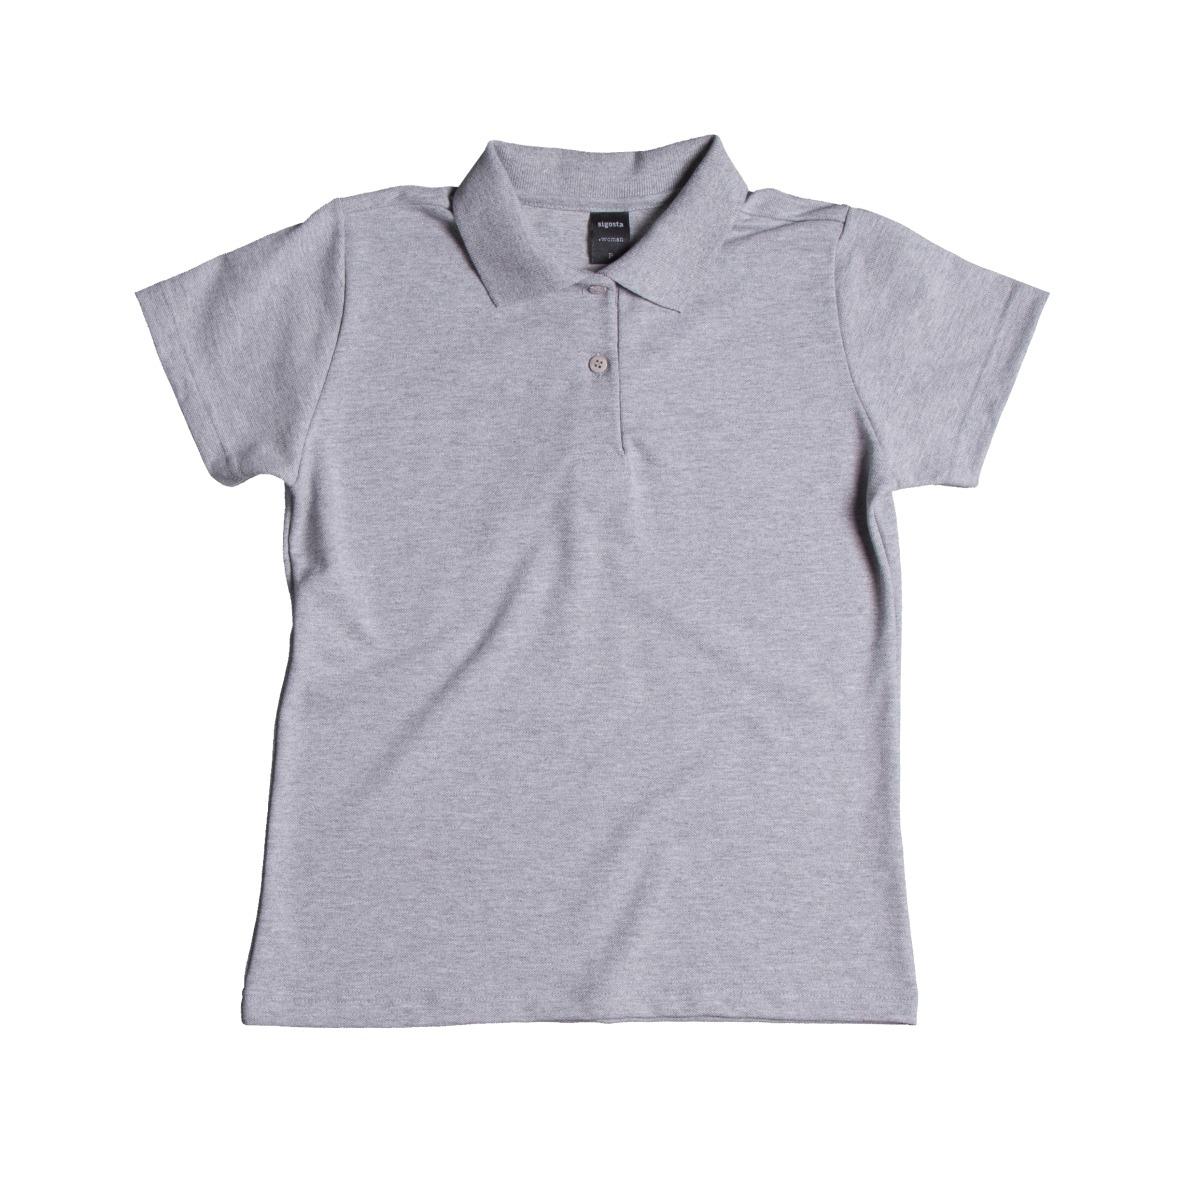 camisa blusa gola polo feminina baby look cinza mescla lisa. Carregando  zoom. 829848d2fc0